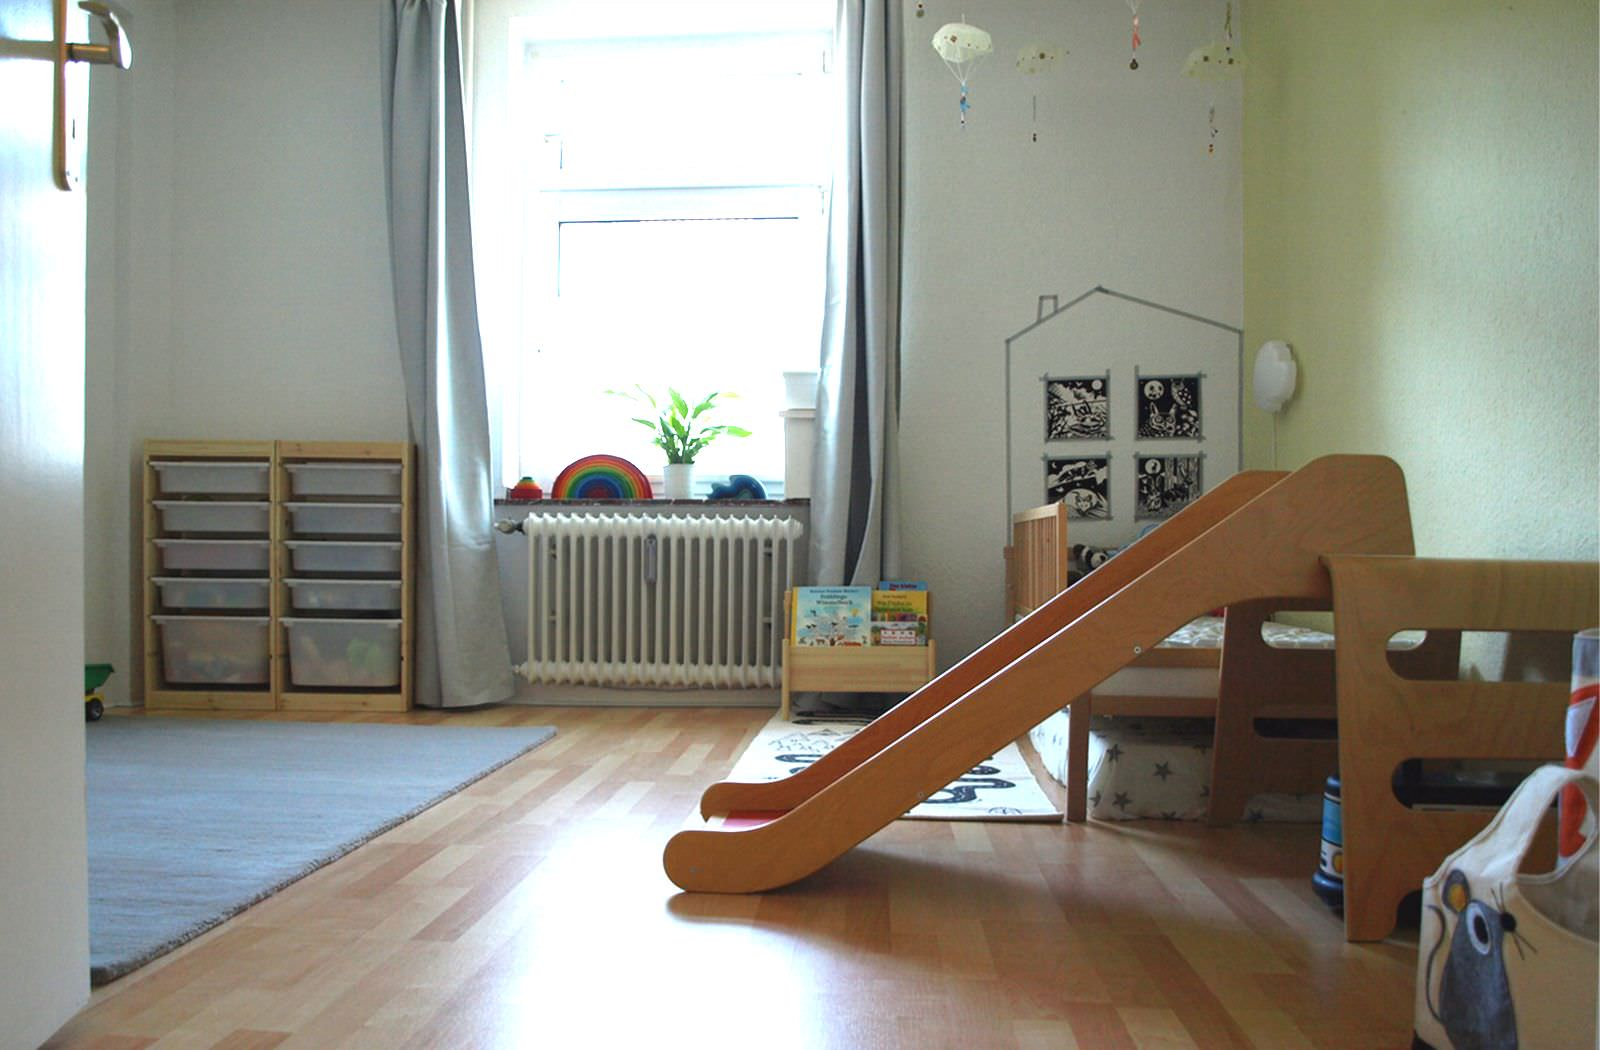 michels kinderzimmer mit 24 monaten montiminis. Black Bedroom Furniture Sets. Home Design Ideas